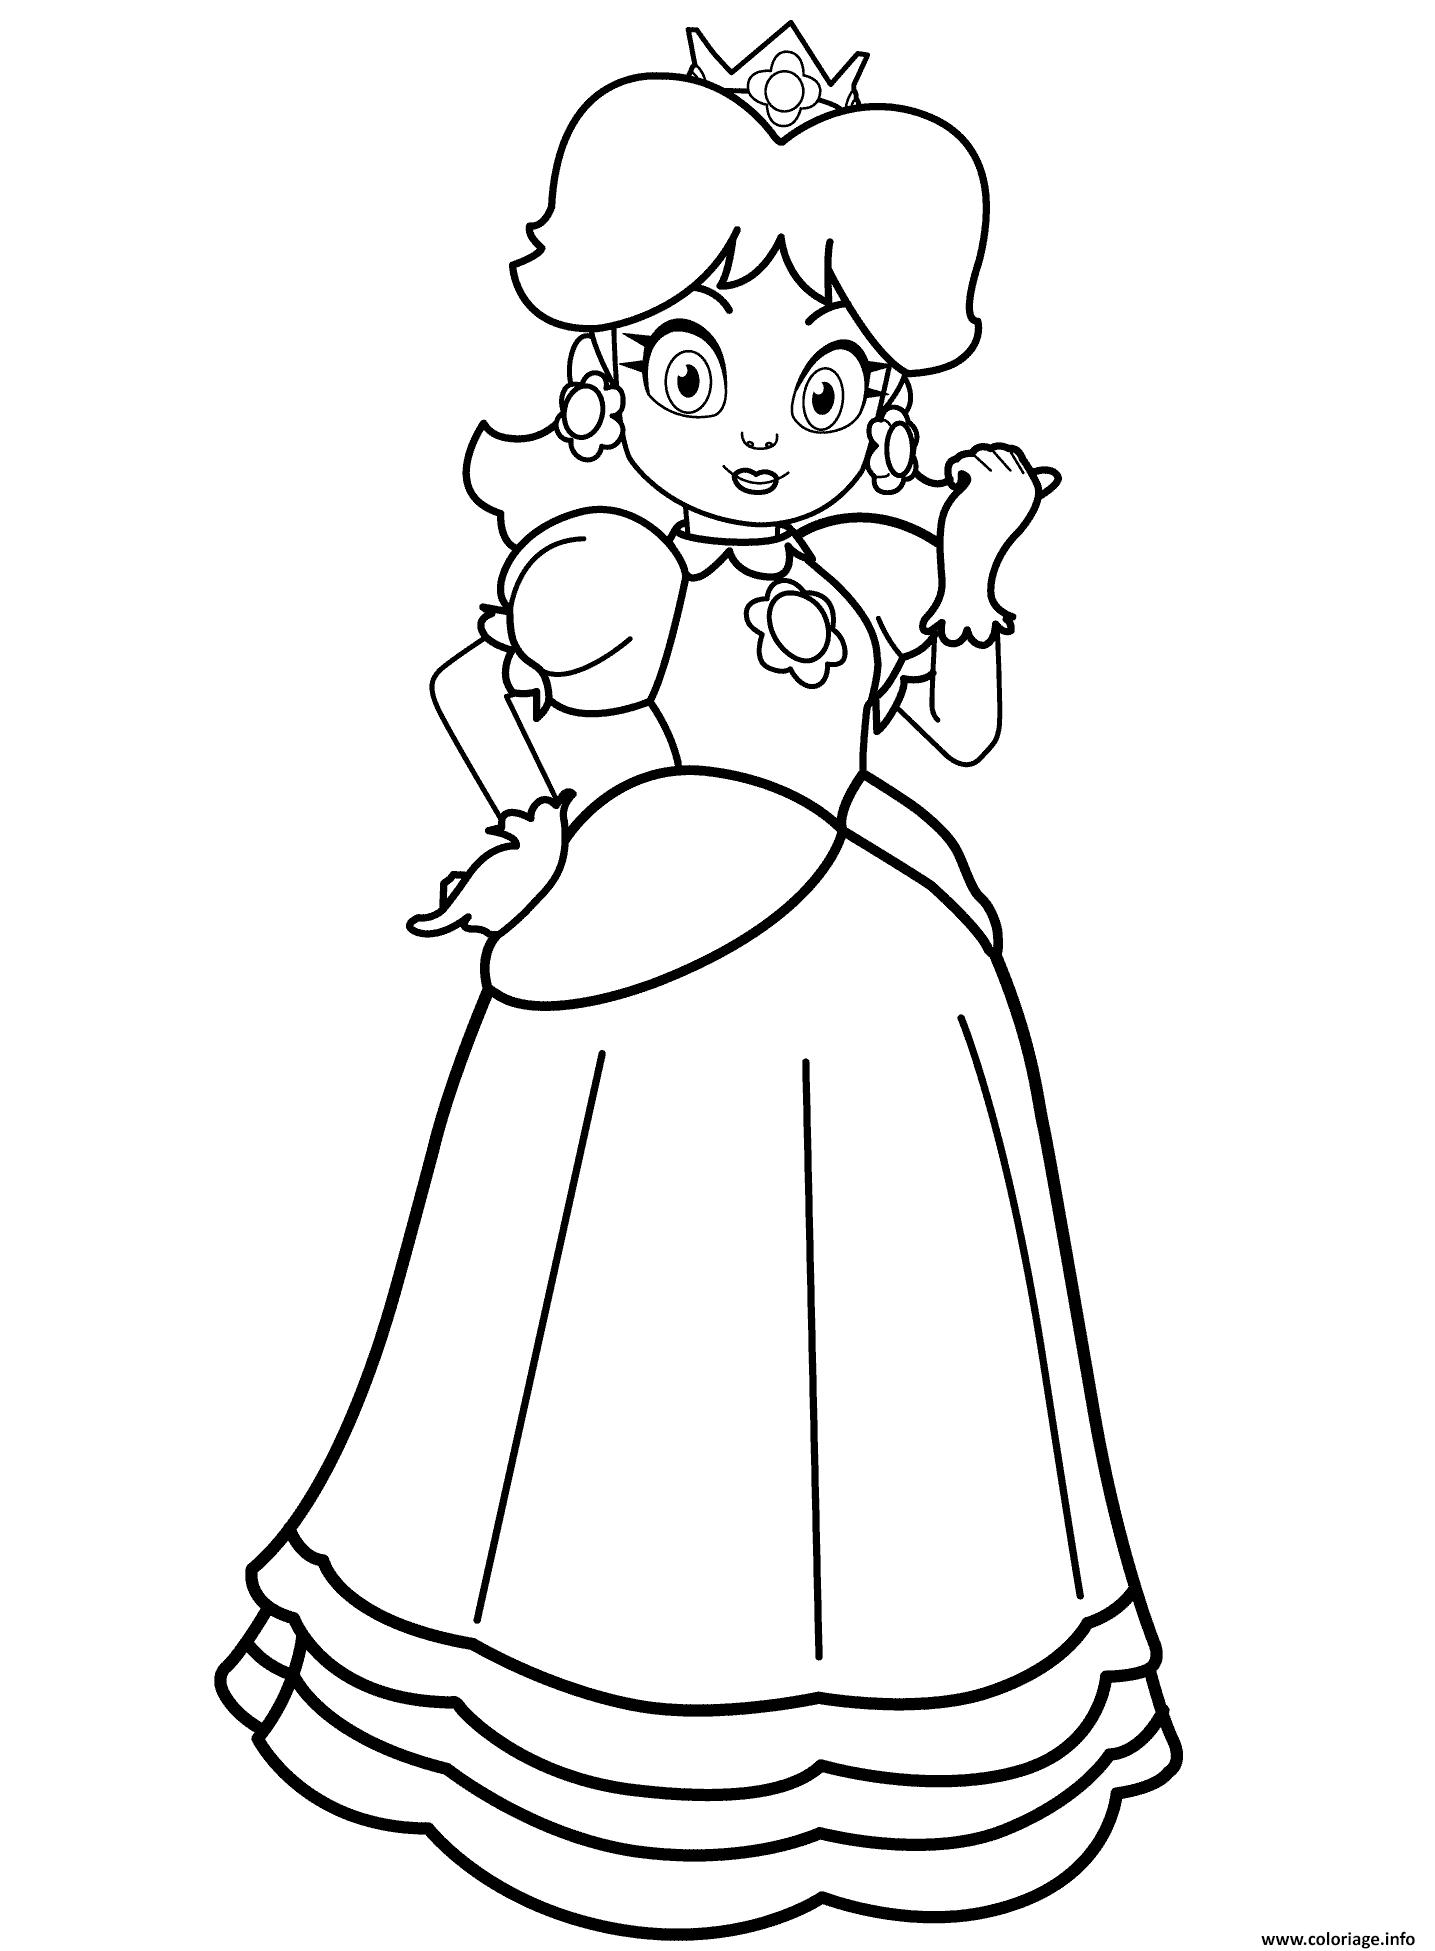 Coloriage Princess Daisy dessin